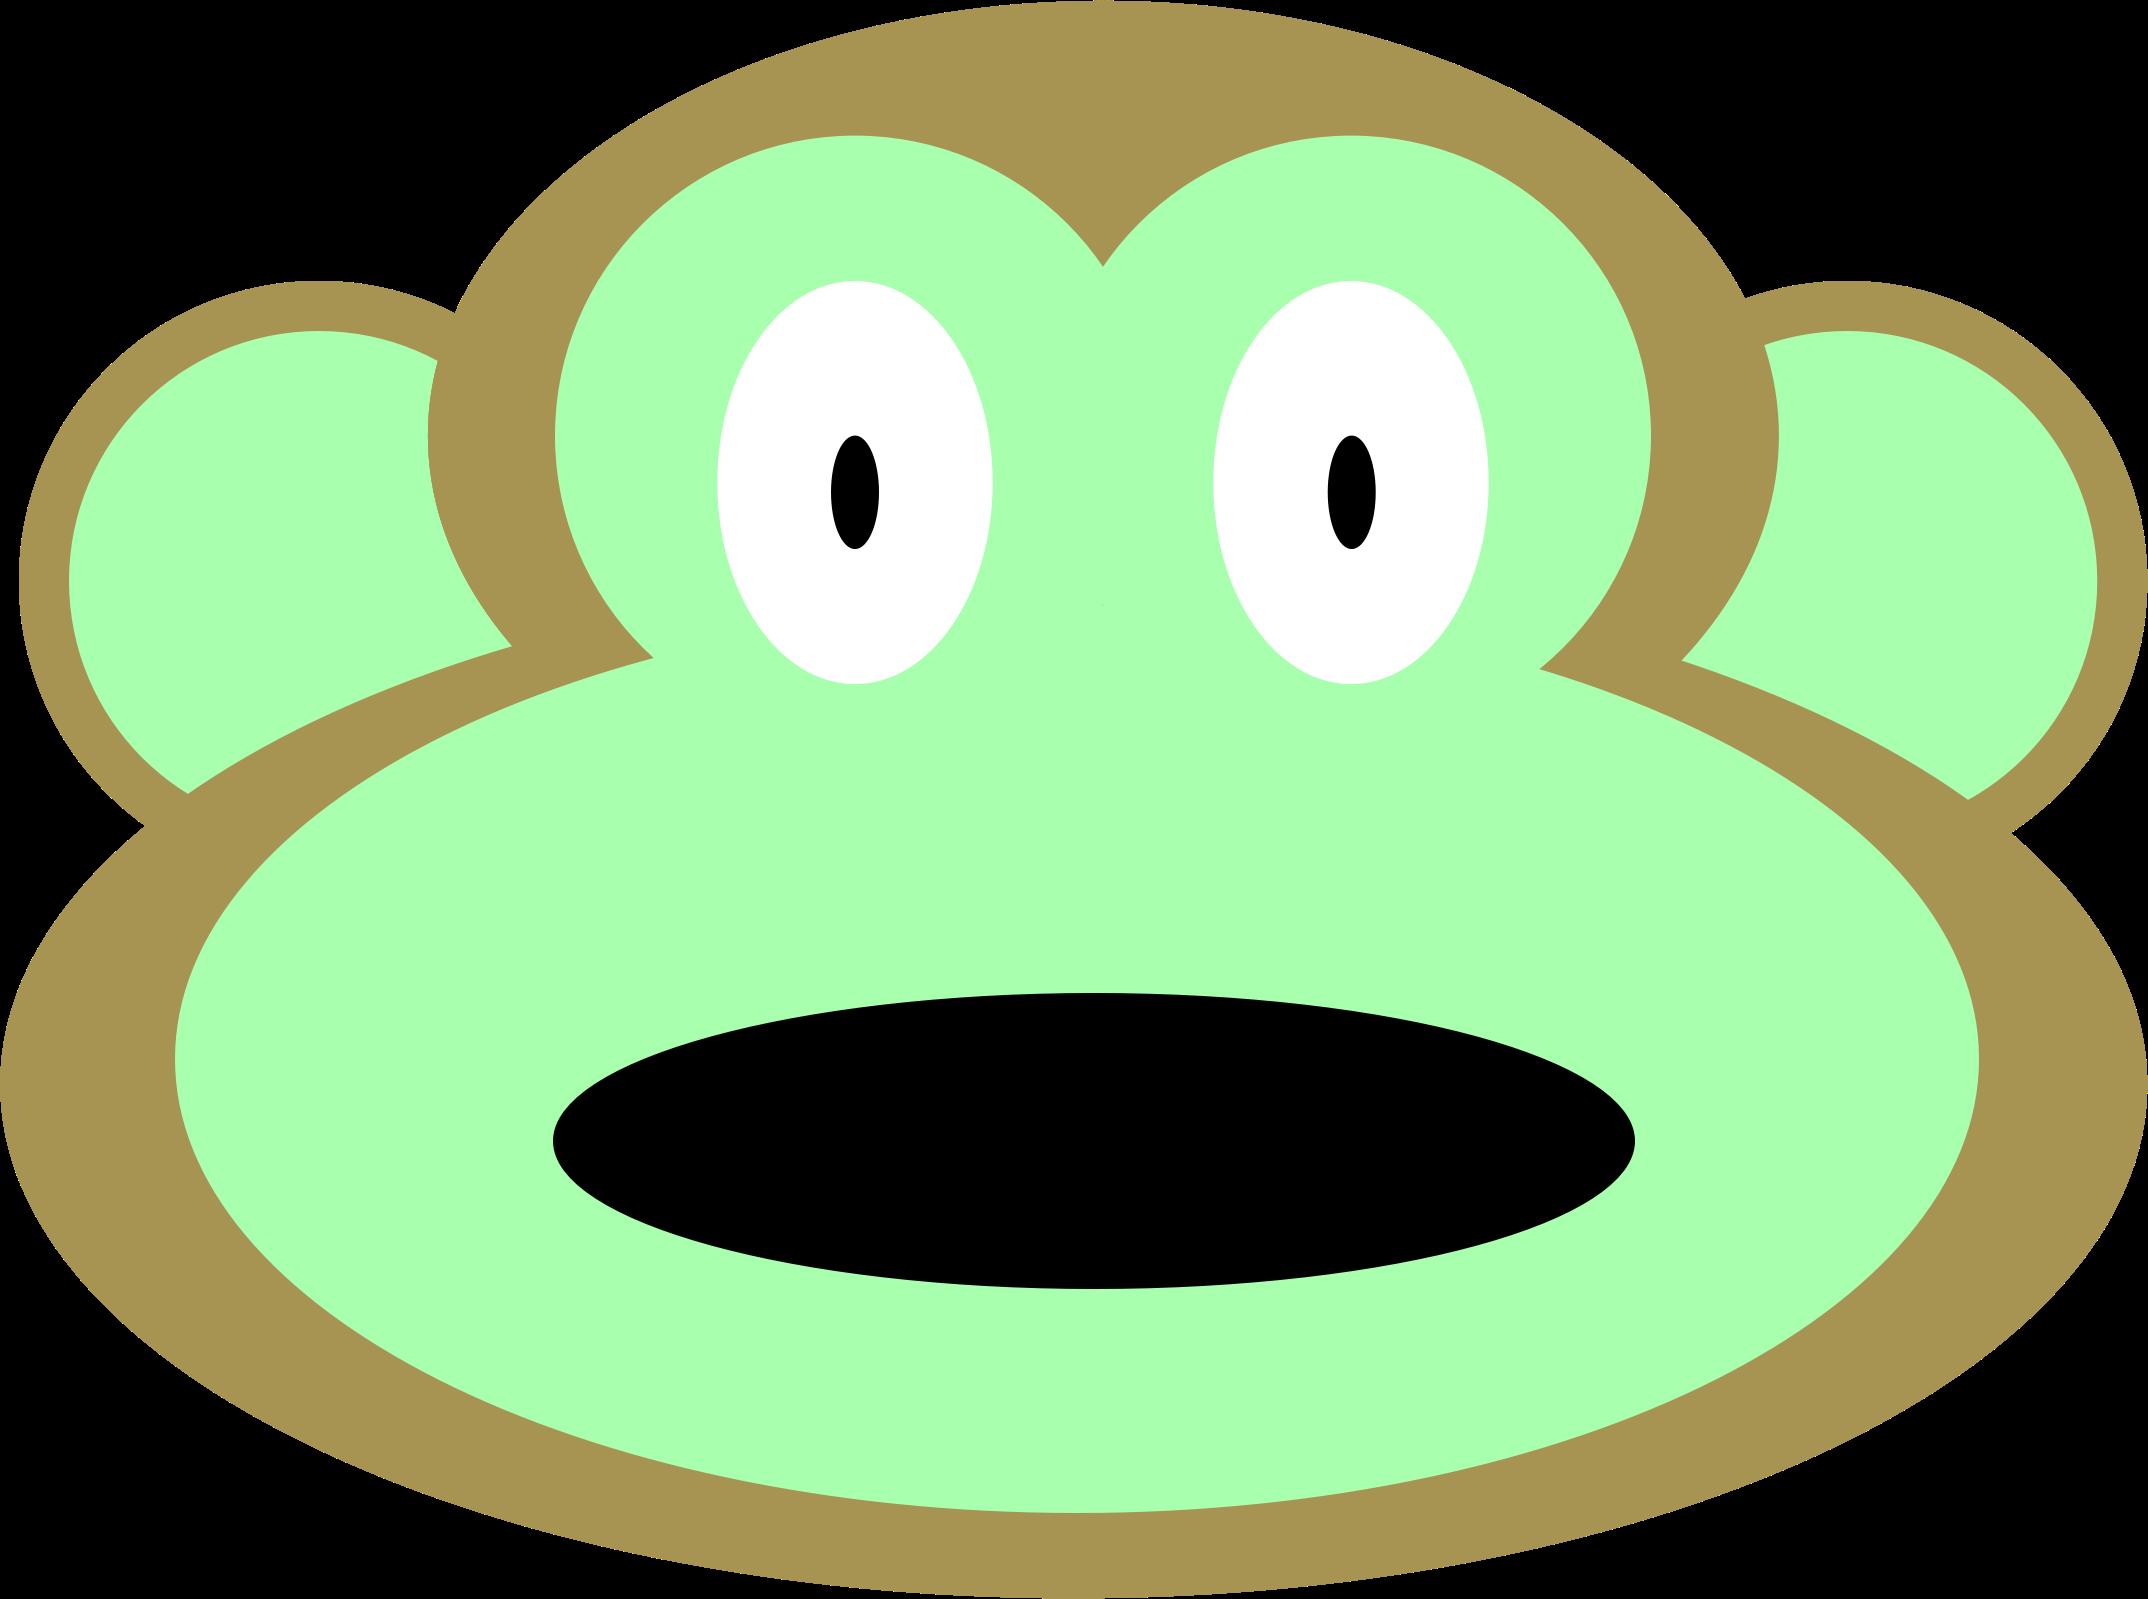 Clipart Monkey Face